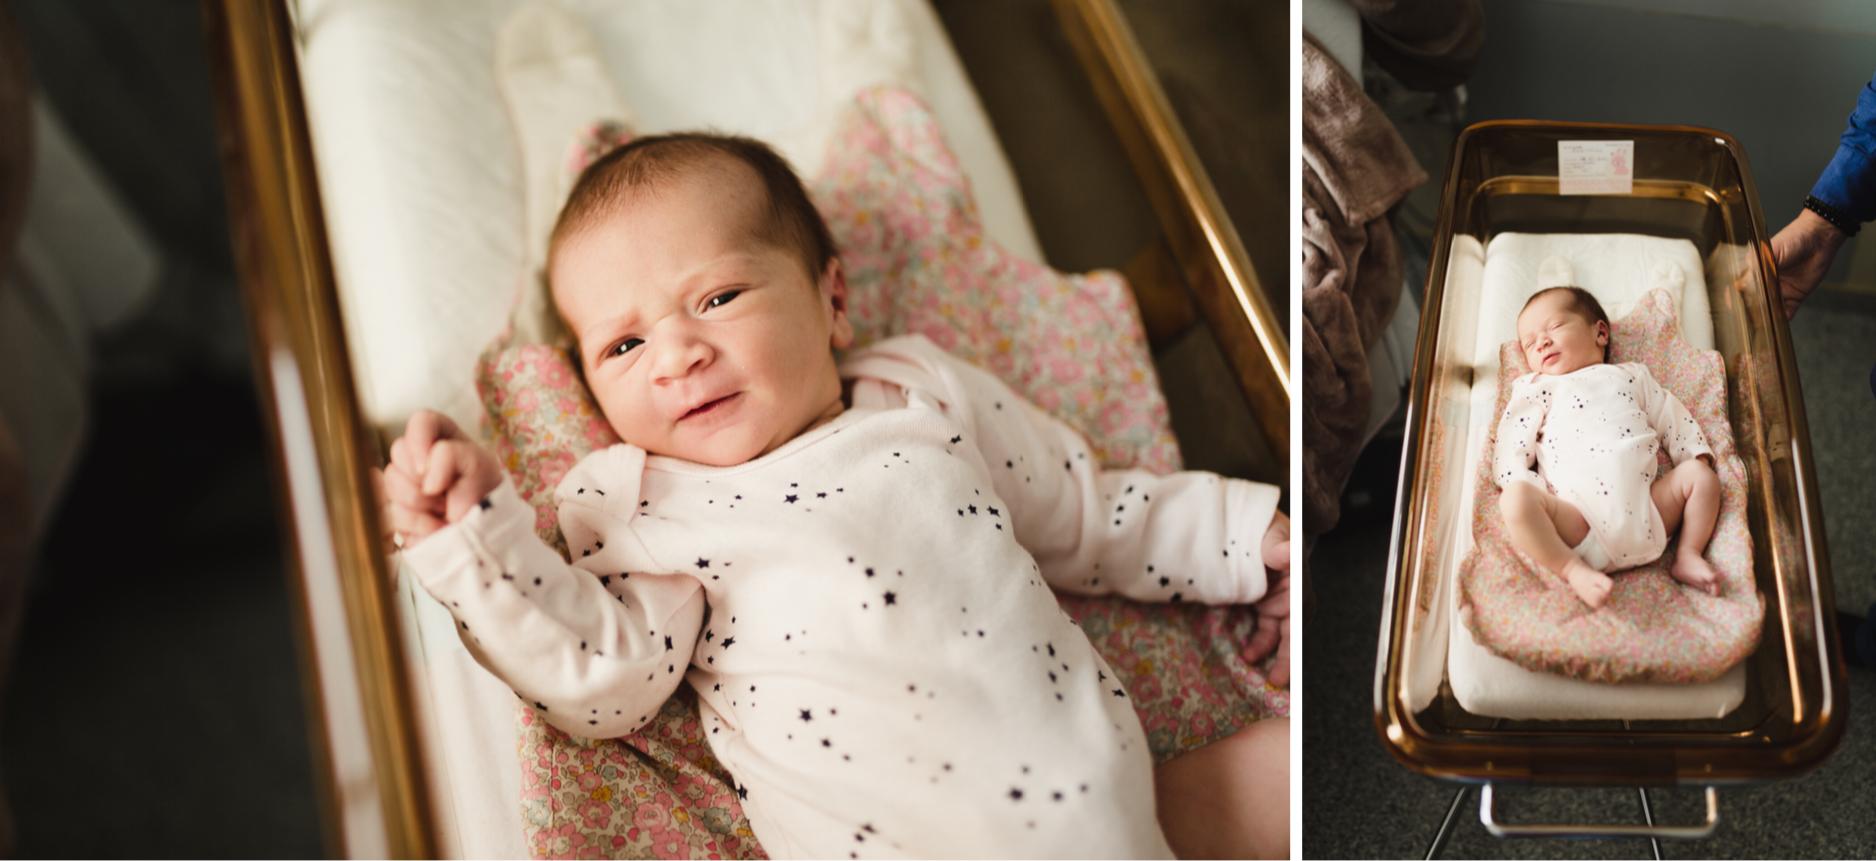 GwenaelleAvet-Photographe-naissance-maternite-paris